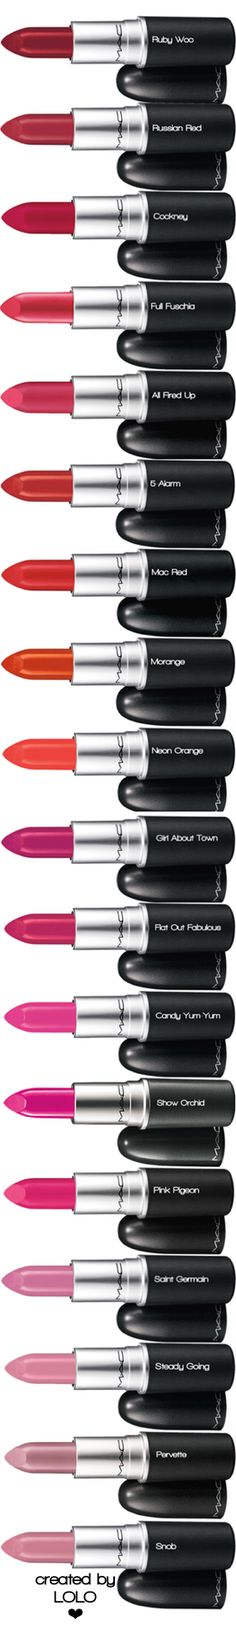 M·A·C Lipstick | LOLO❤